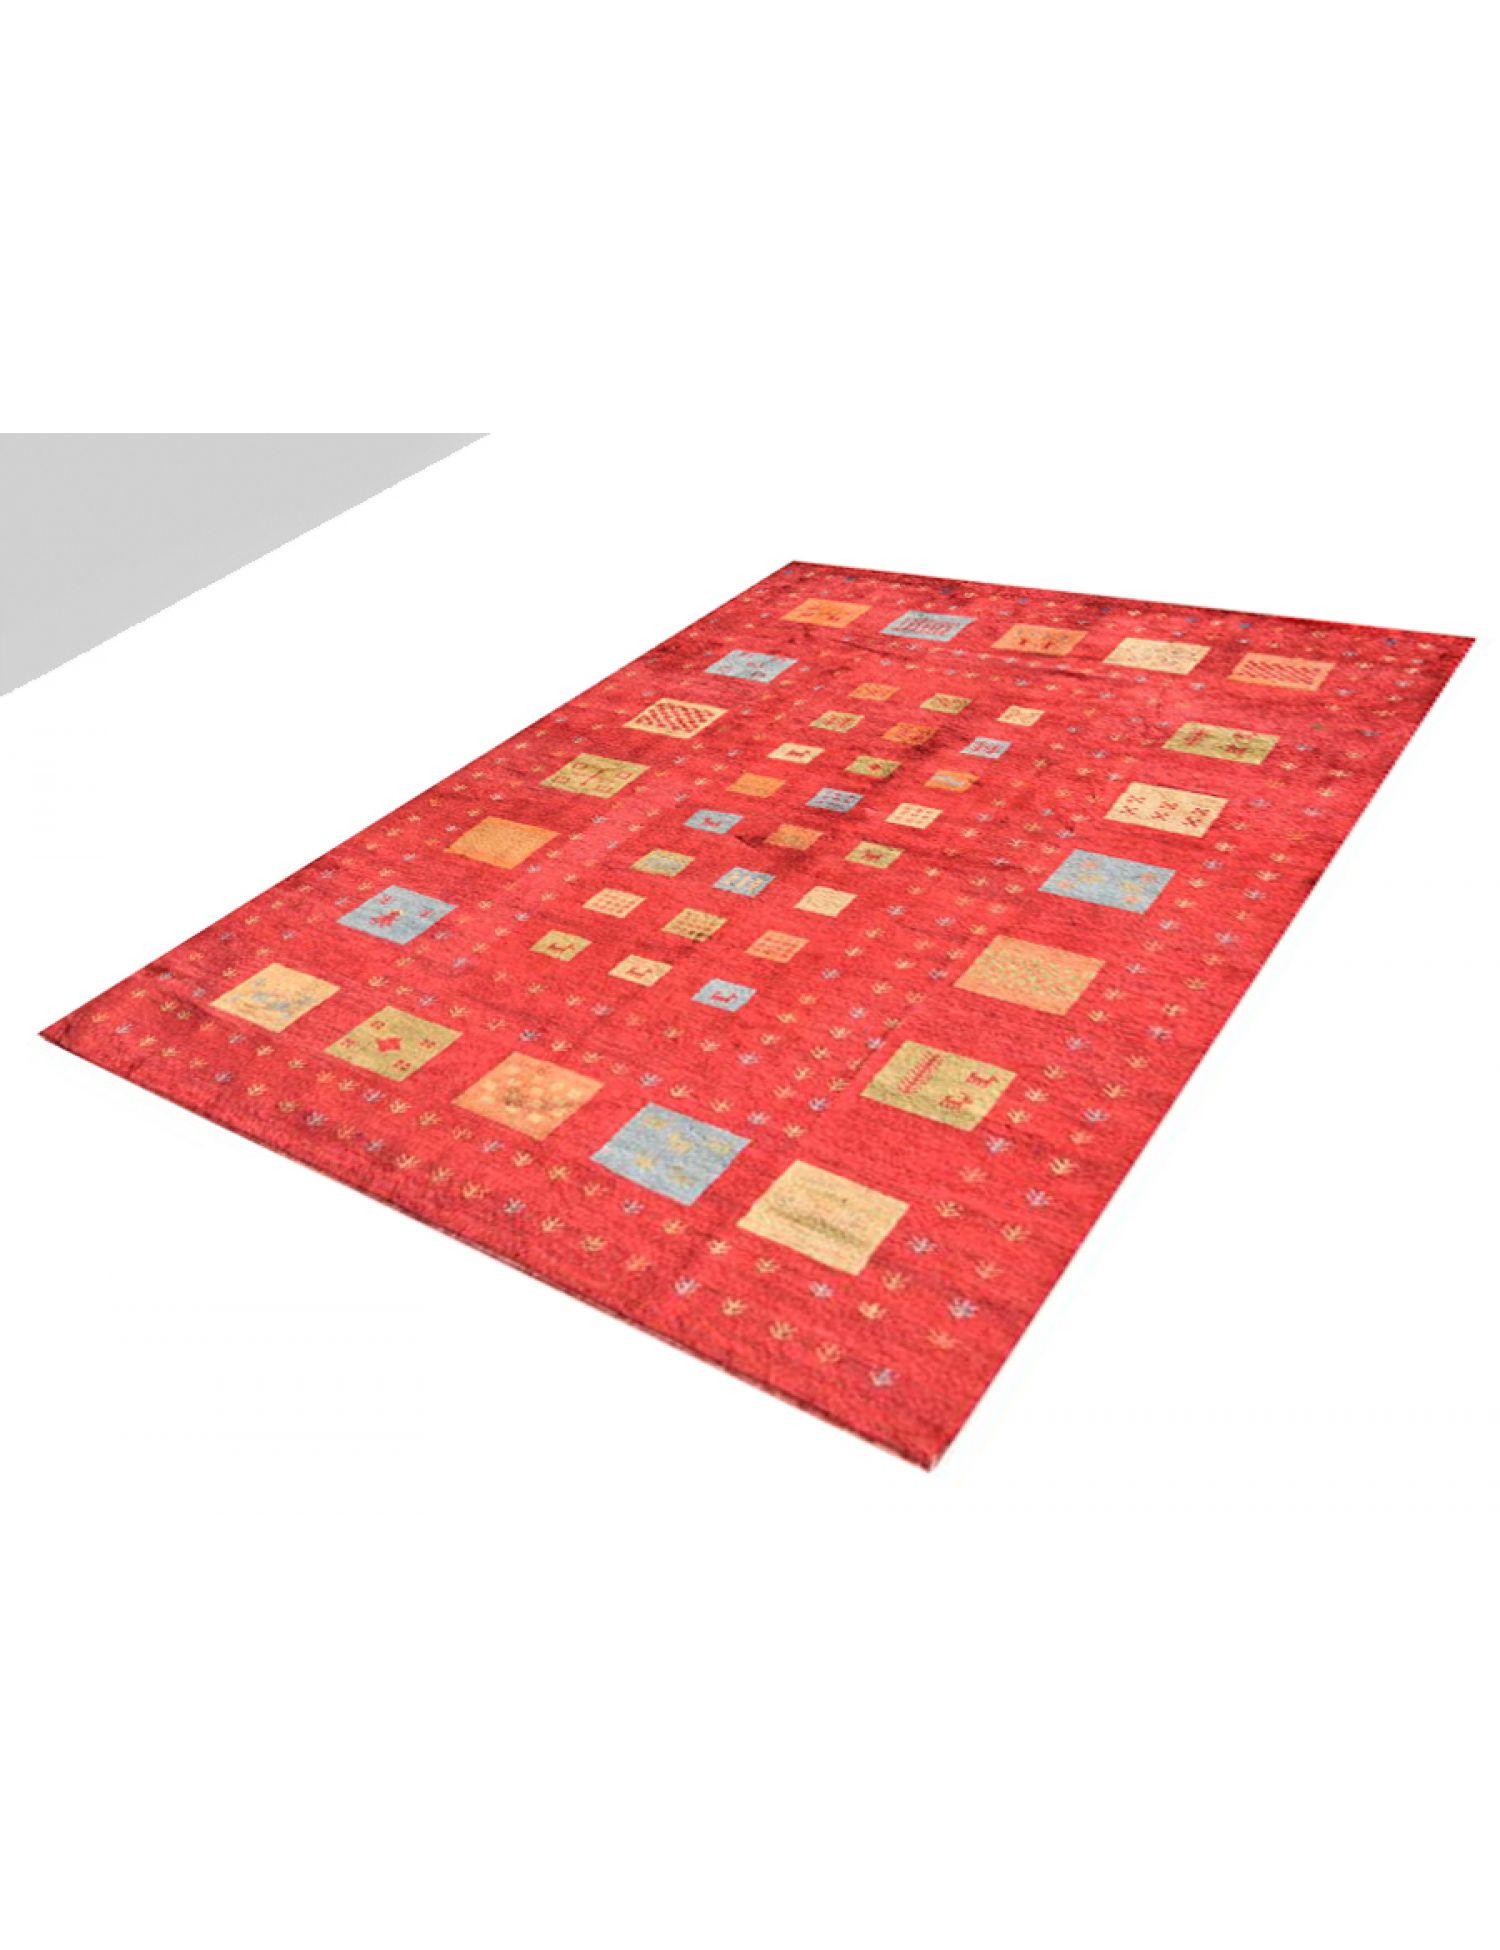 Moderne Teppiche  mehrfarbig <br/>295 x 205 cm